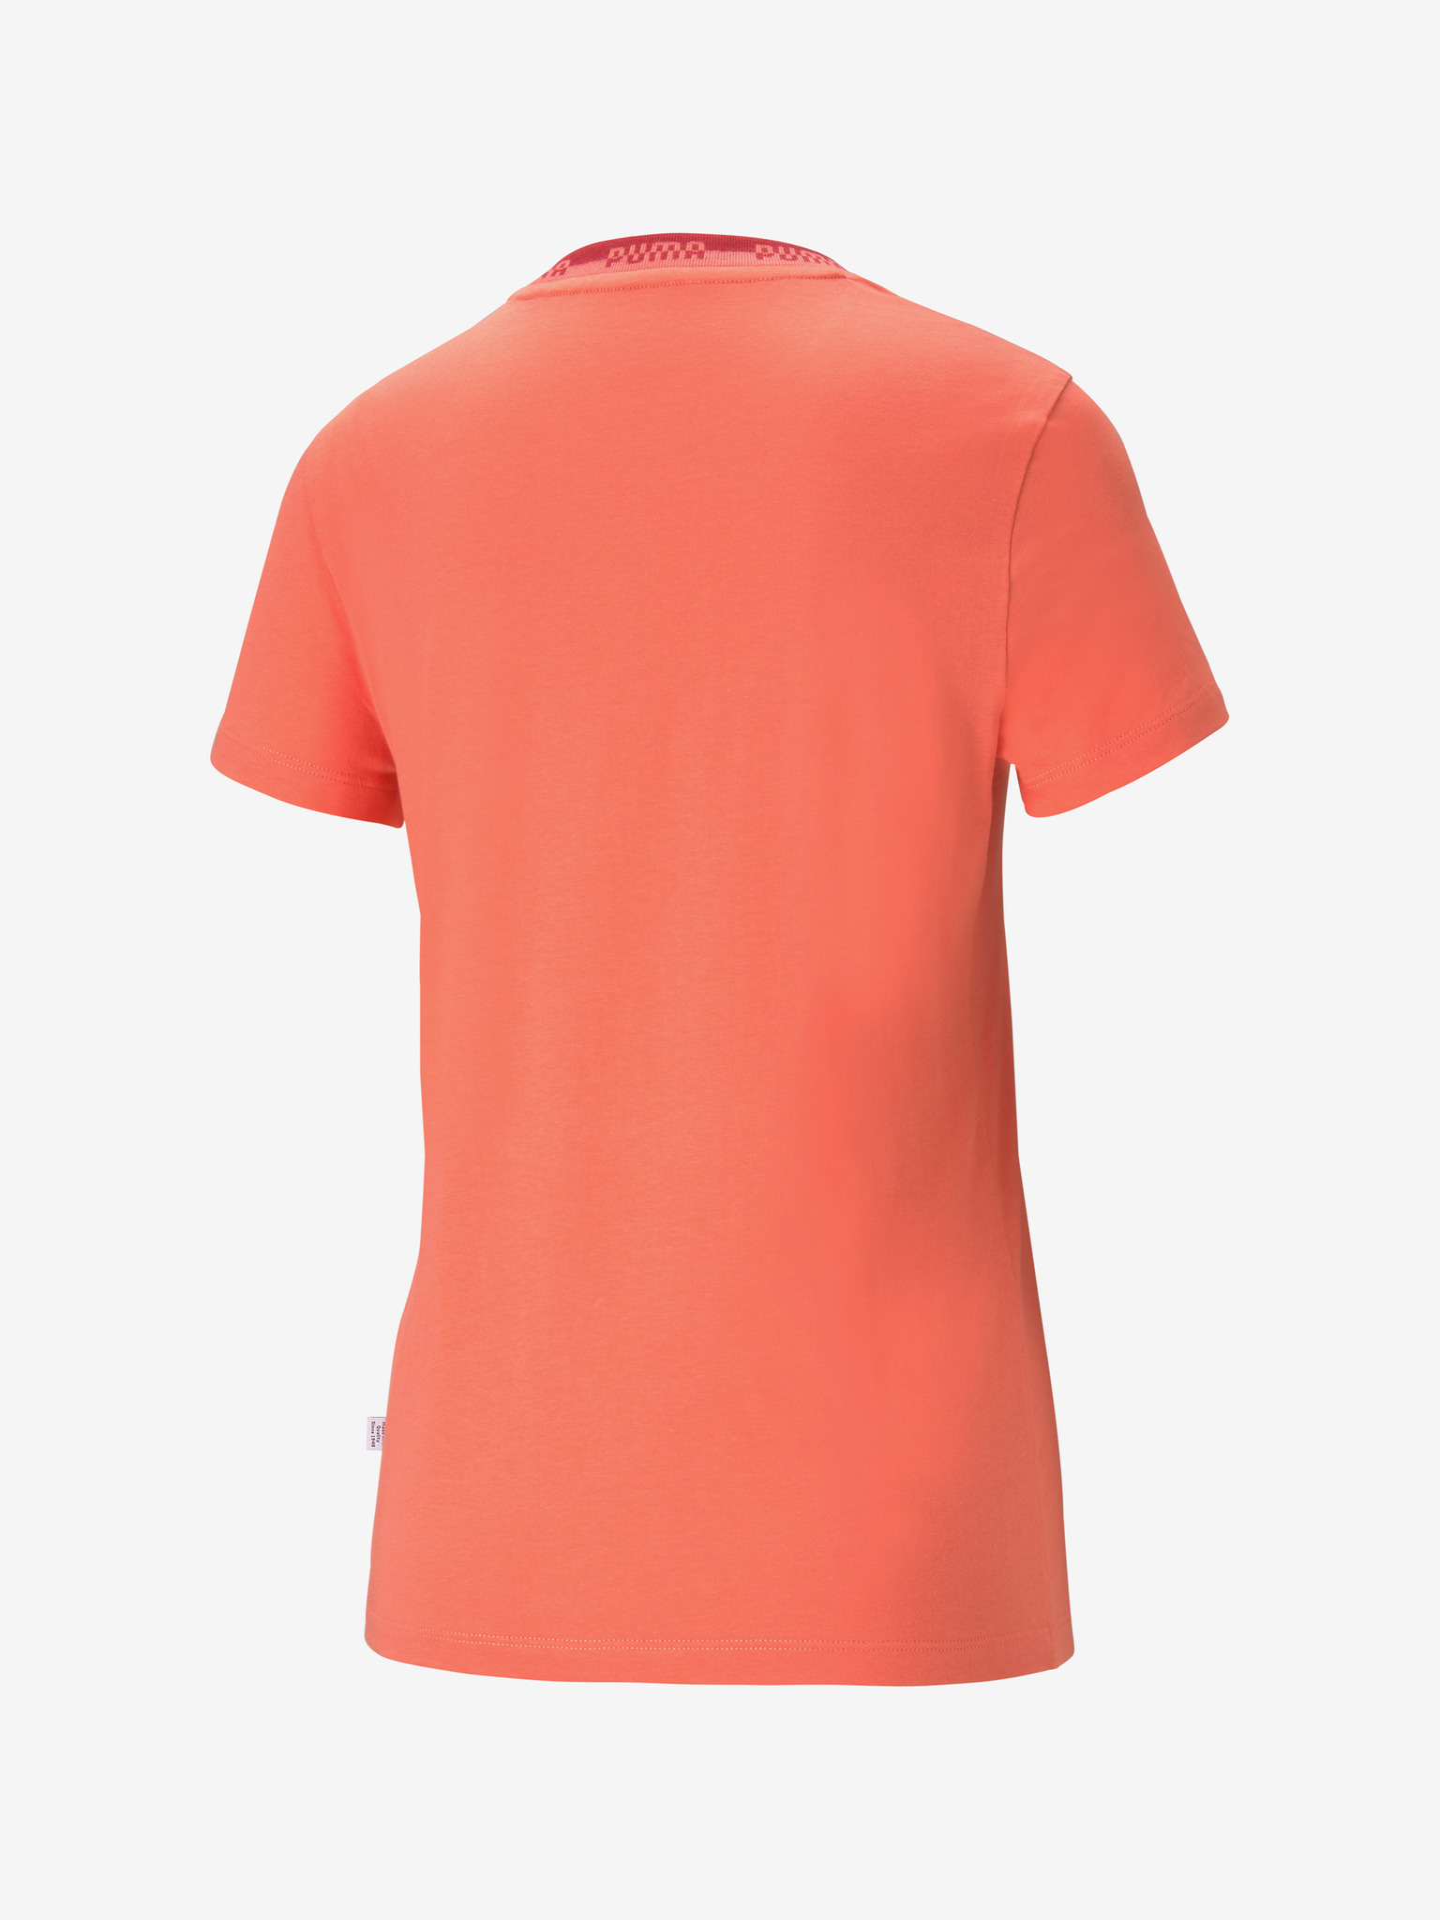 Puma Amplified T-shirt Orange